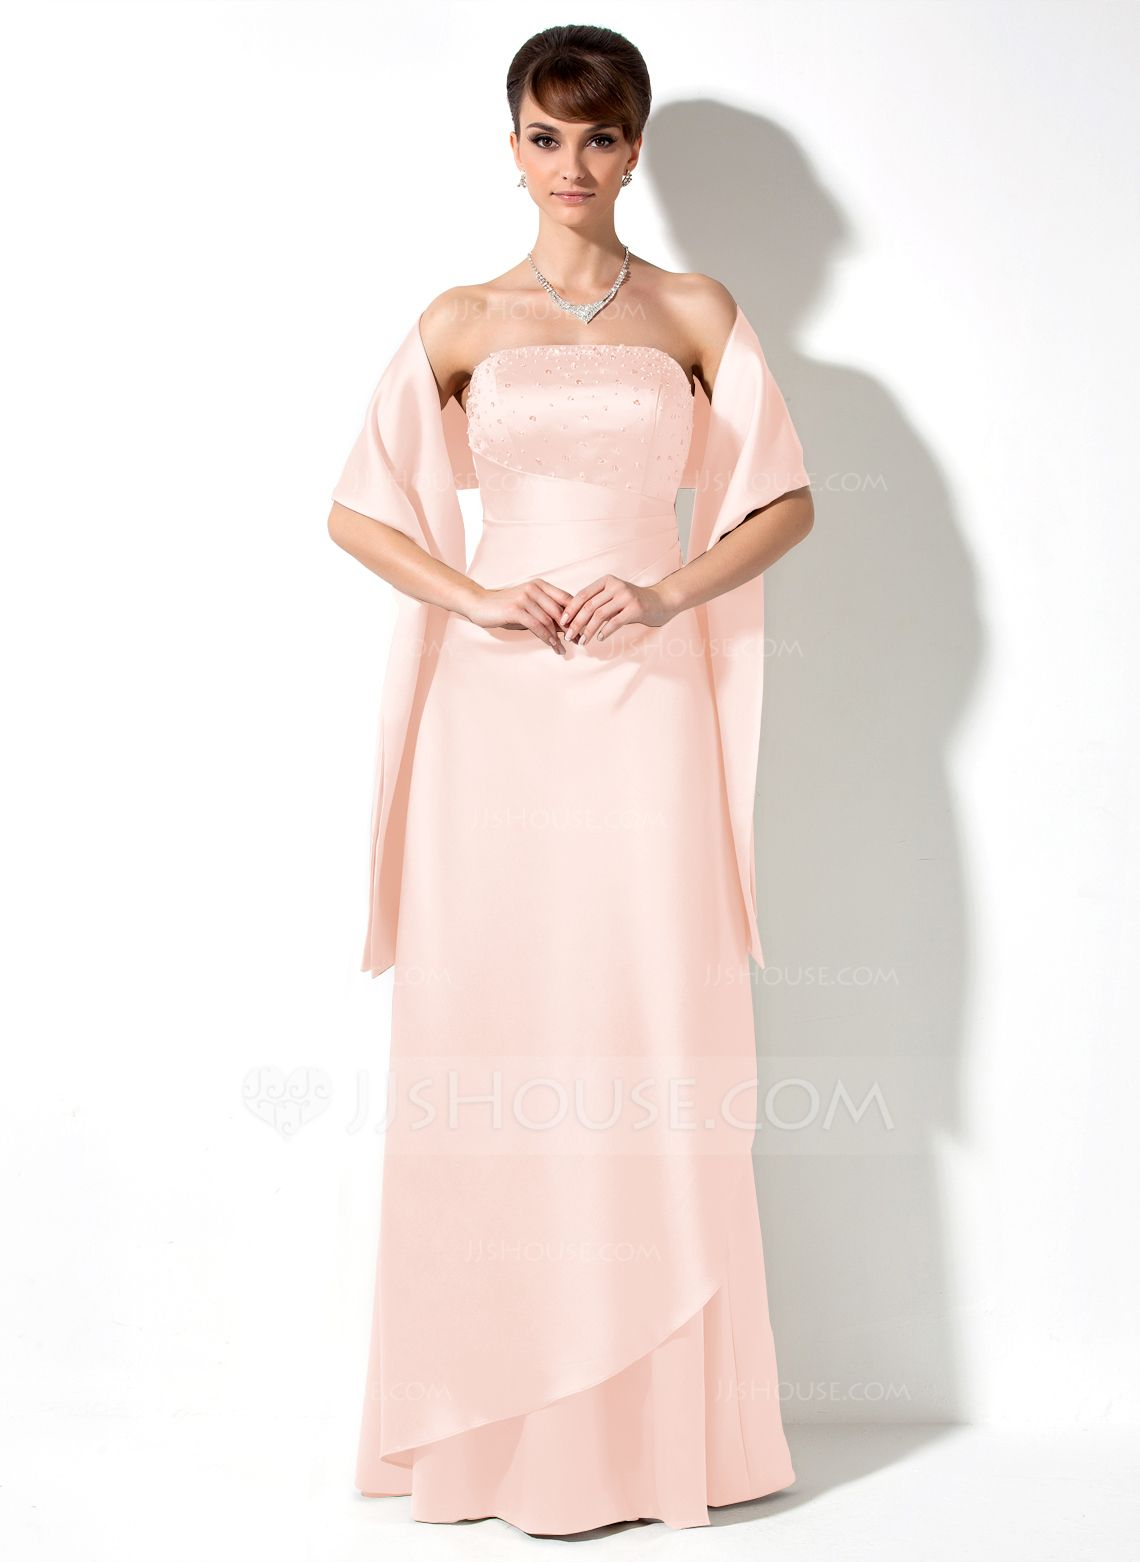 Alineprincess strapless floorlength satin bridesmaid dress with